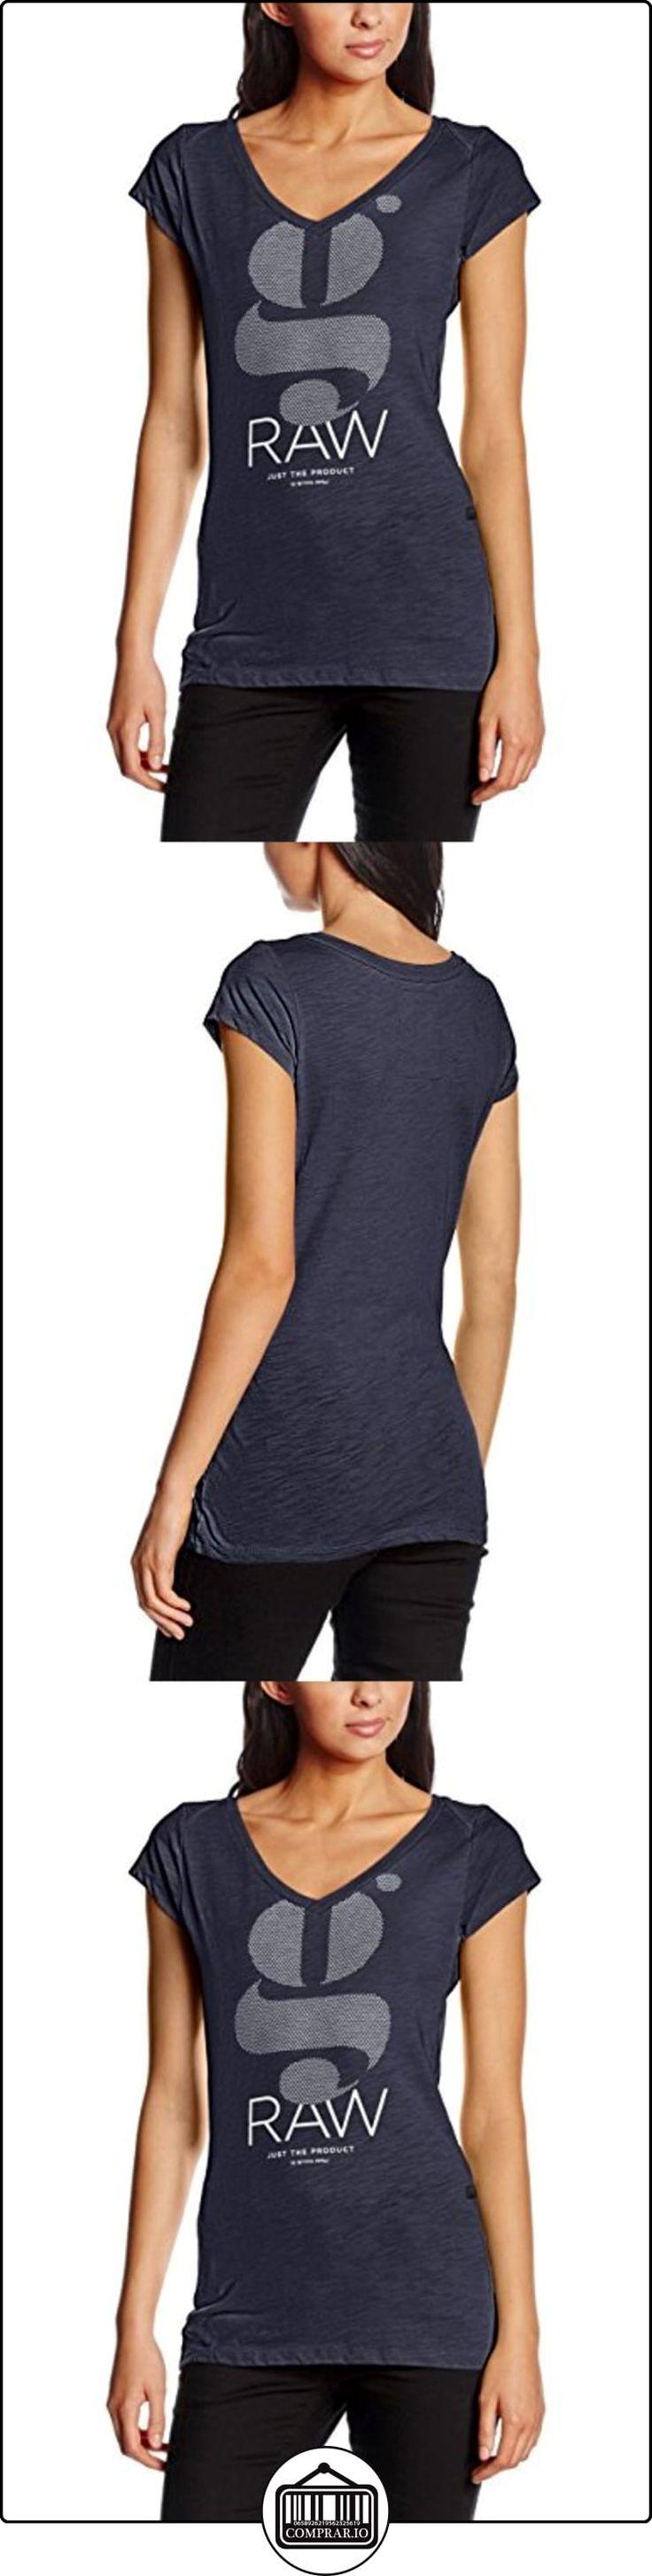 G-Star Raw, Loreen v t wmn cap sl - Camiseta de manga corta para mujer, Azul (Sartho Blue 6067), Small  ✿ Blusas y camisas ✿